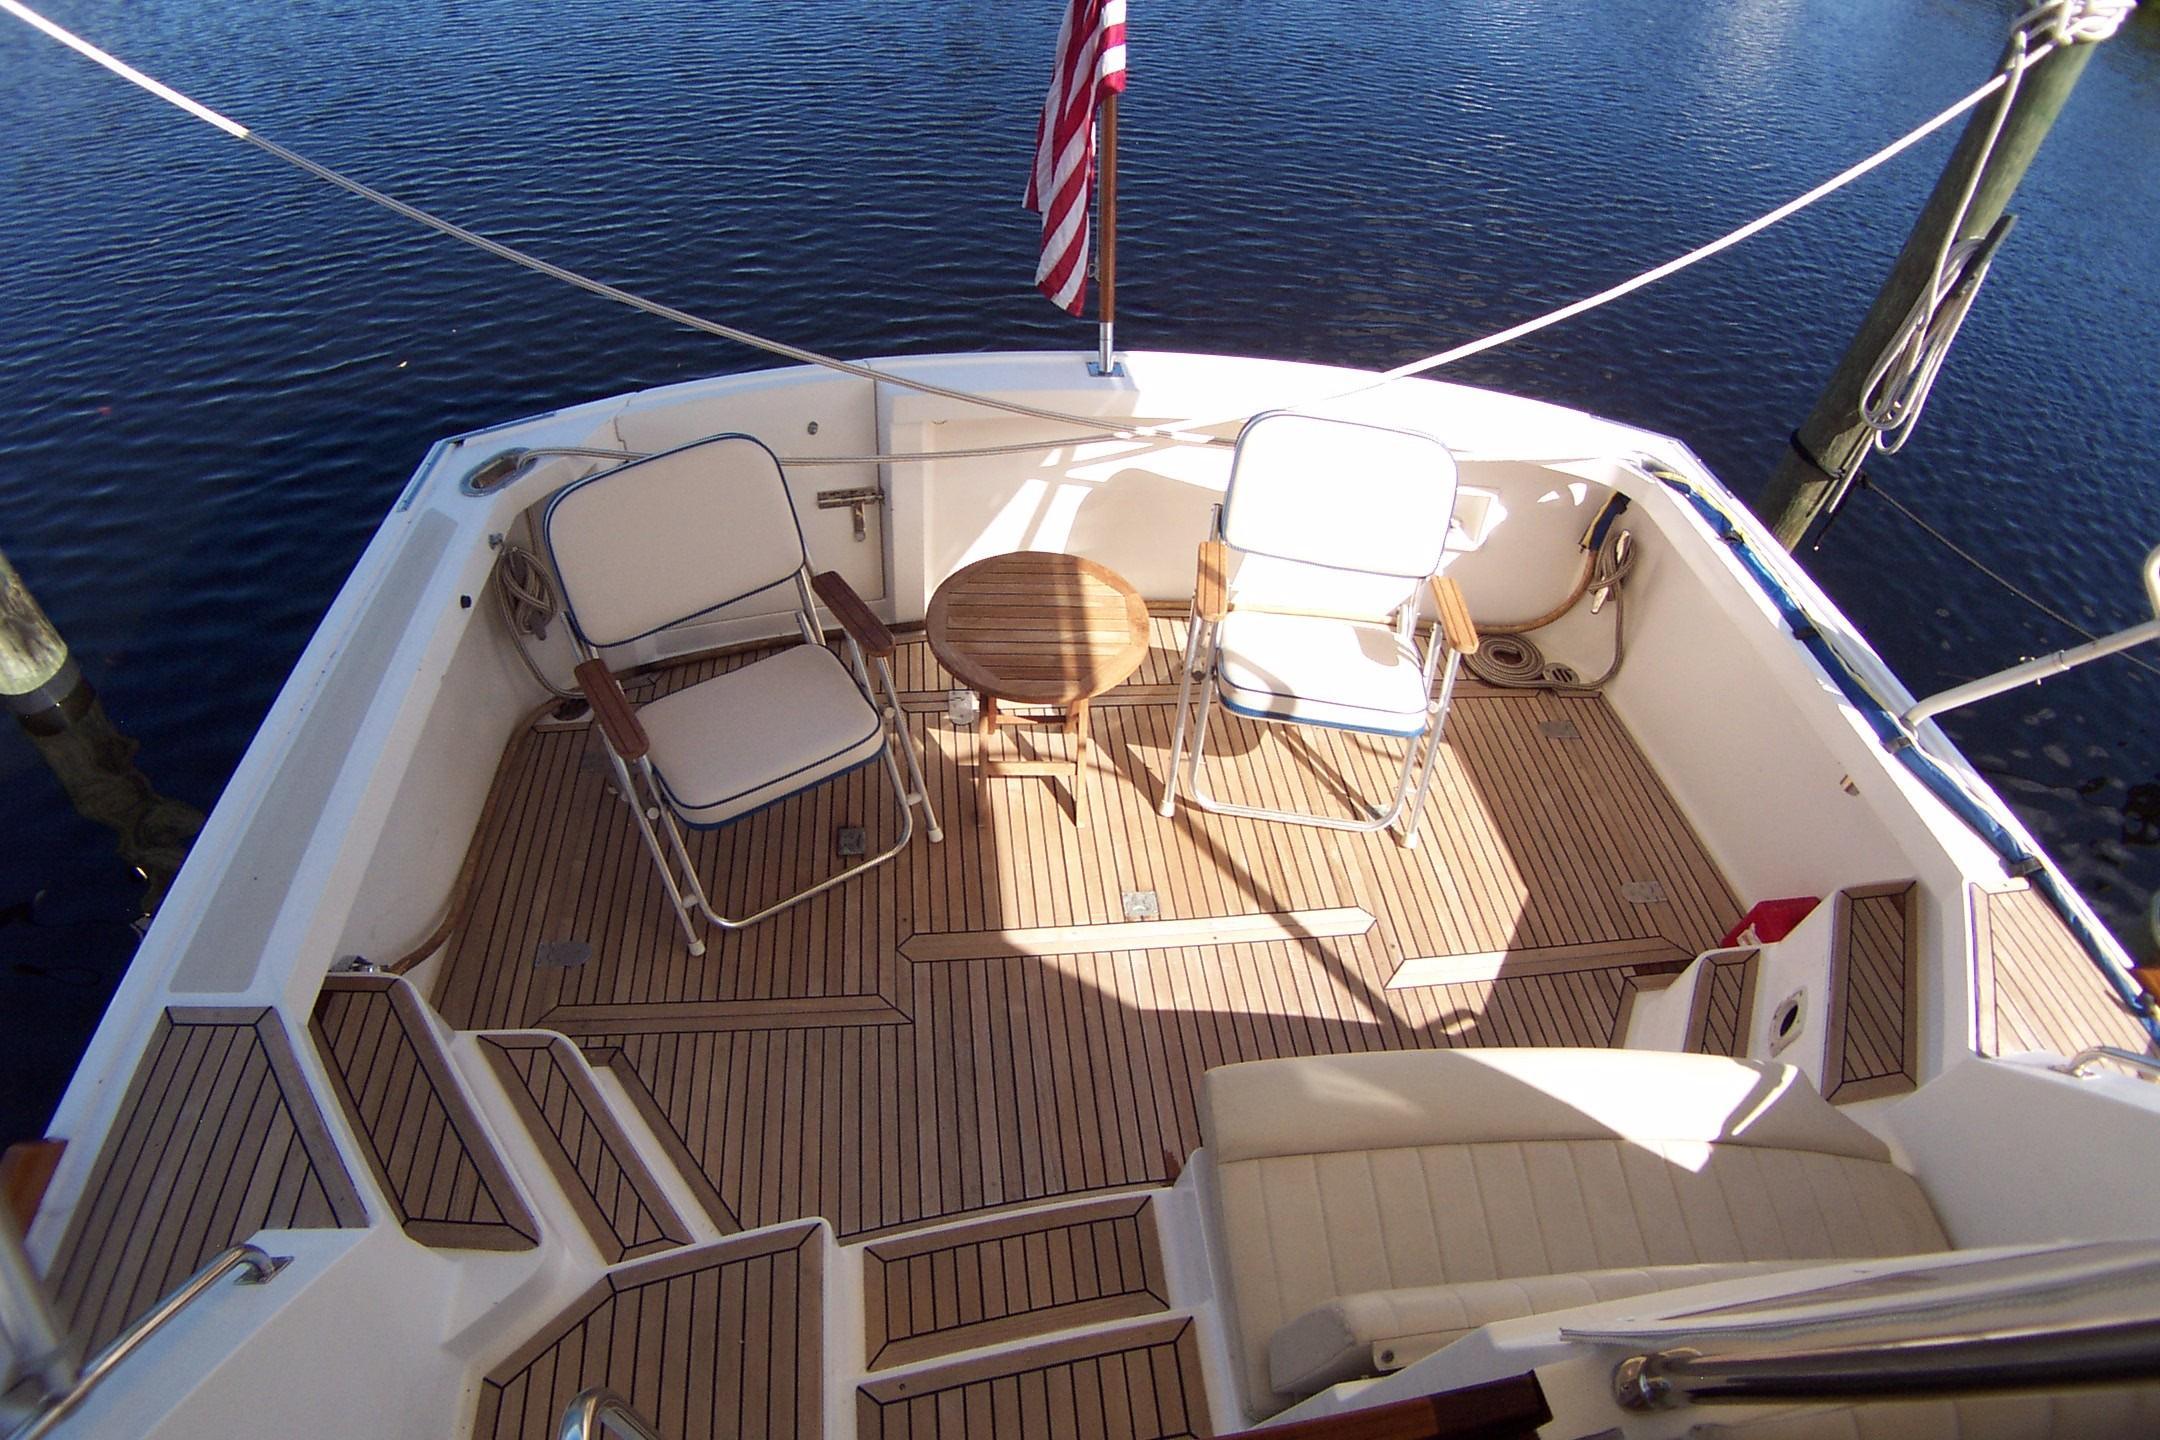 2002 Grand Banks Eastbay 43 Hx Yacht For Sale In Stuart Fl Brilliant